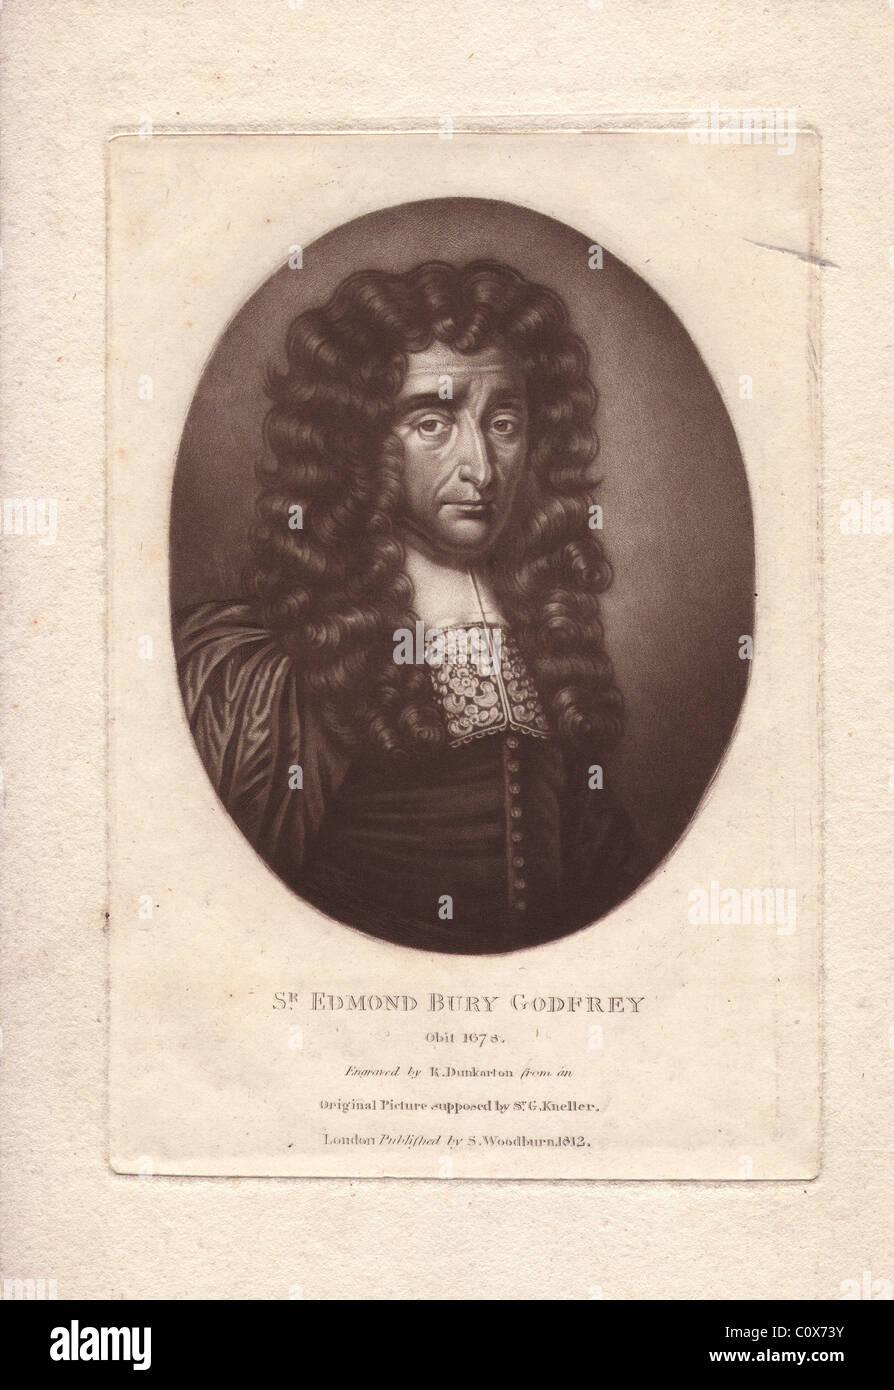 Sir Edmond Bury Godfrey (1621-1678), English magistrate - Stock Image